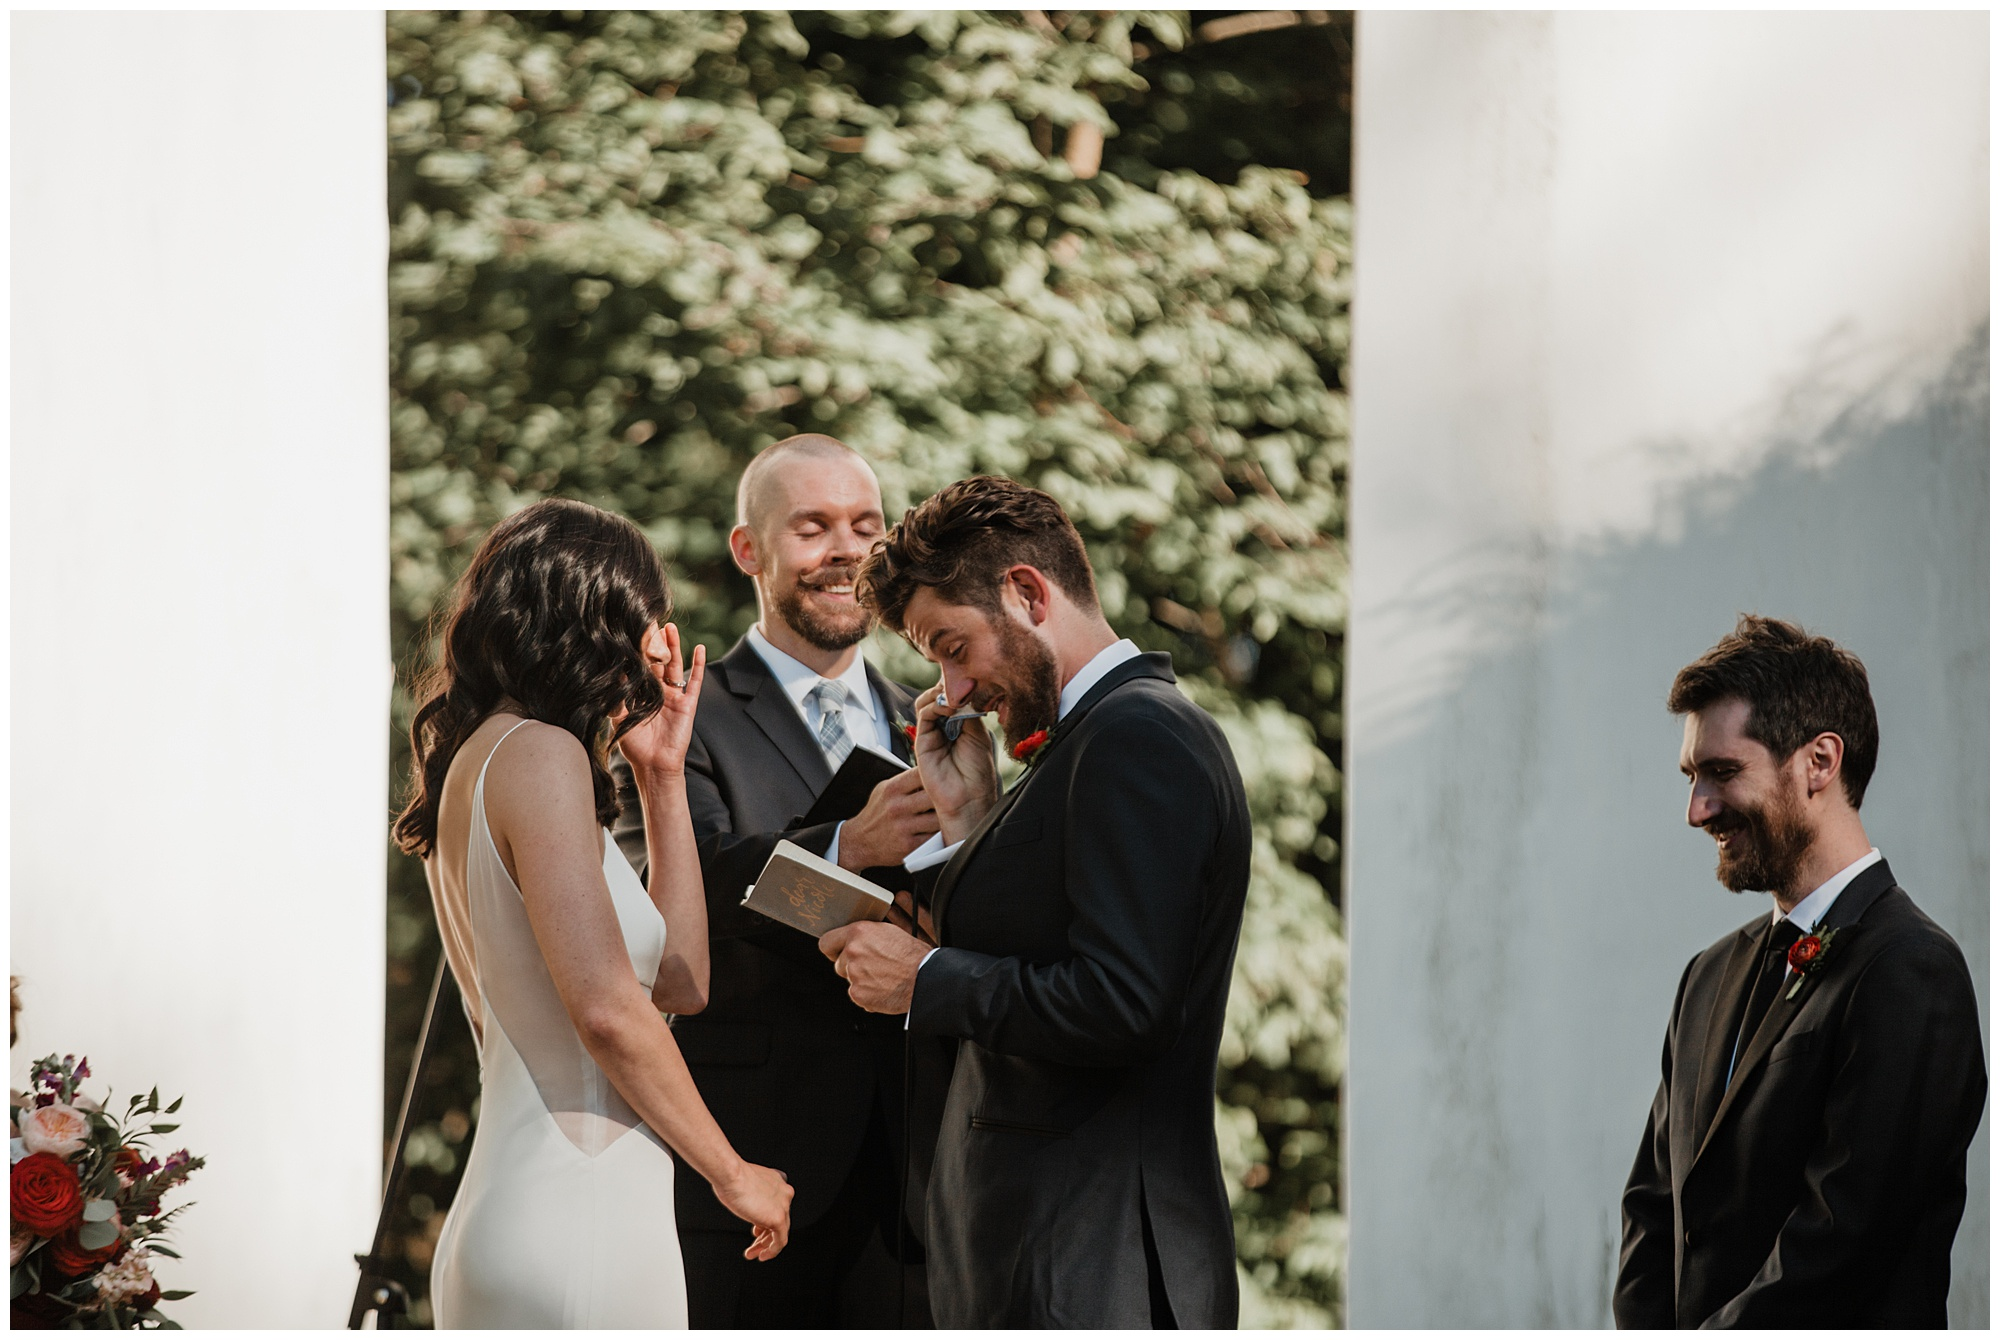 allerton_park_wedding_champaign_il_chicago_wright_photographs_ne_0089.jpg